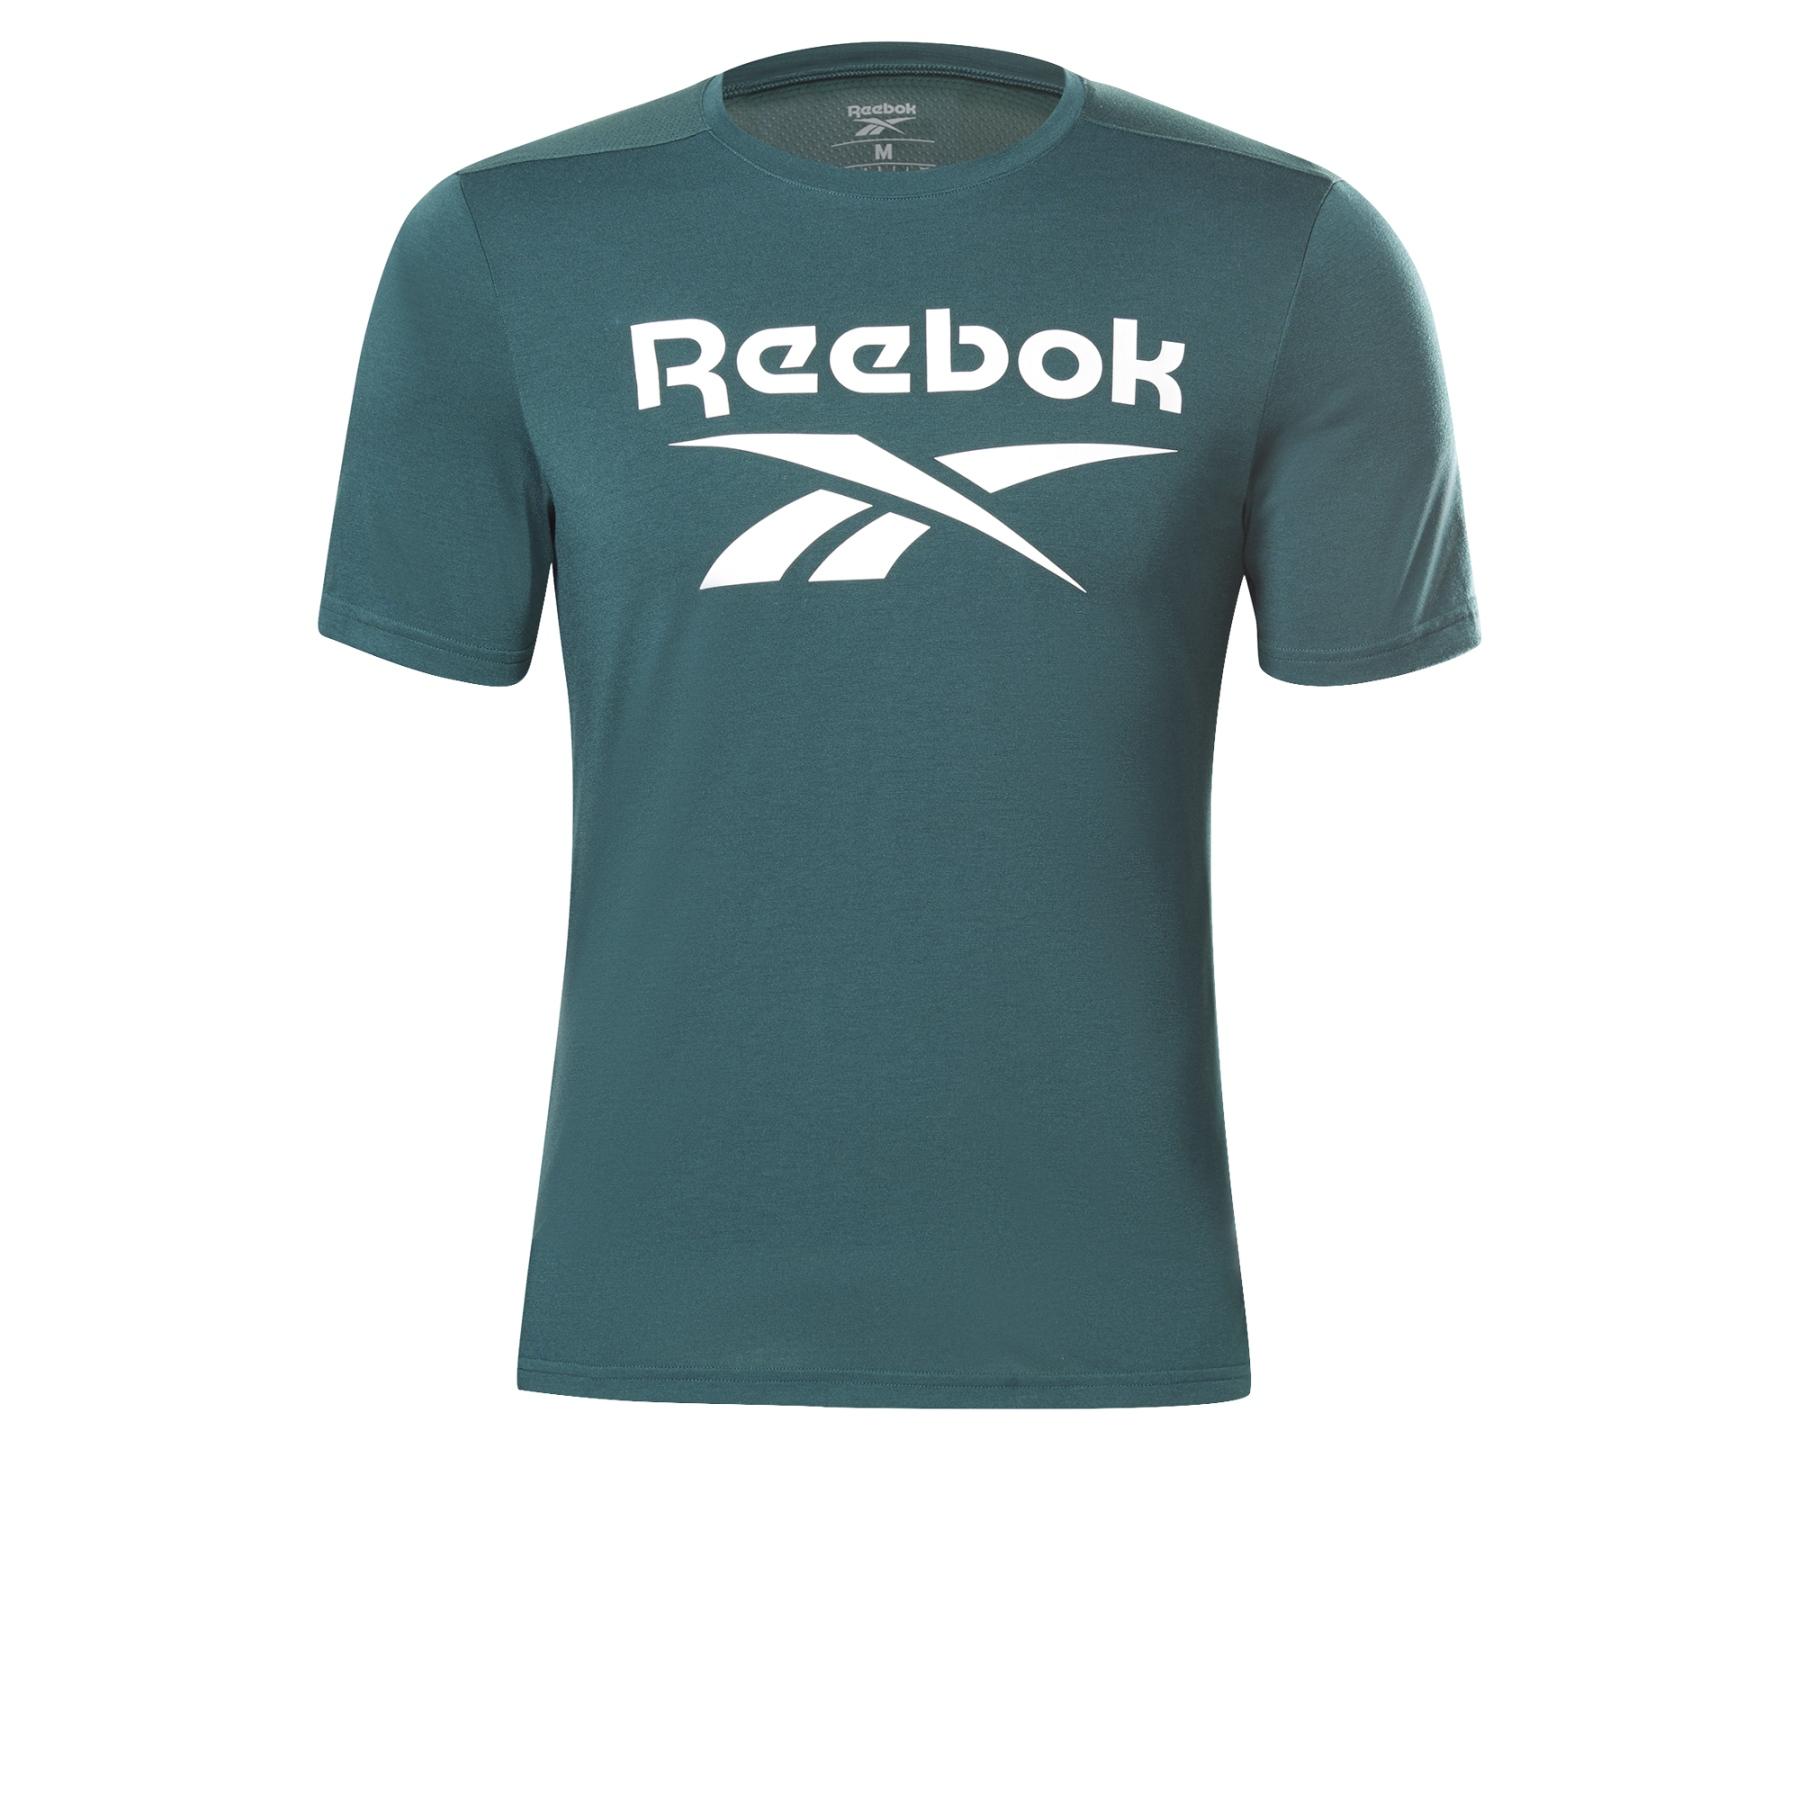 Reebok Workout Ready Supremium Graphic Camiseta - forest green GJ0676